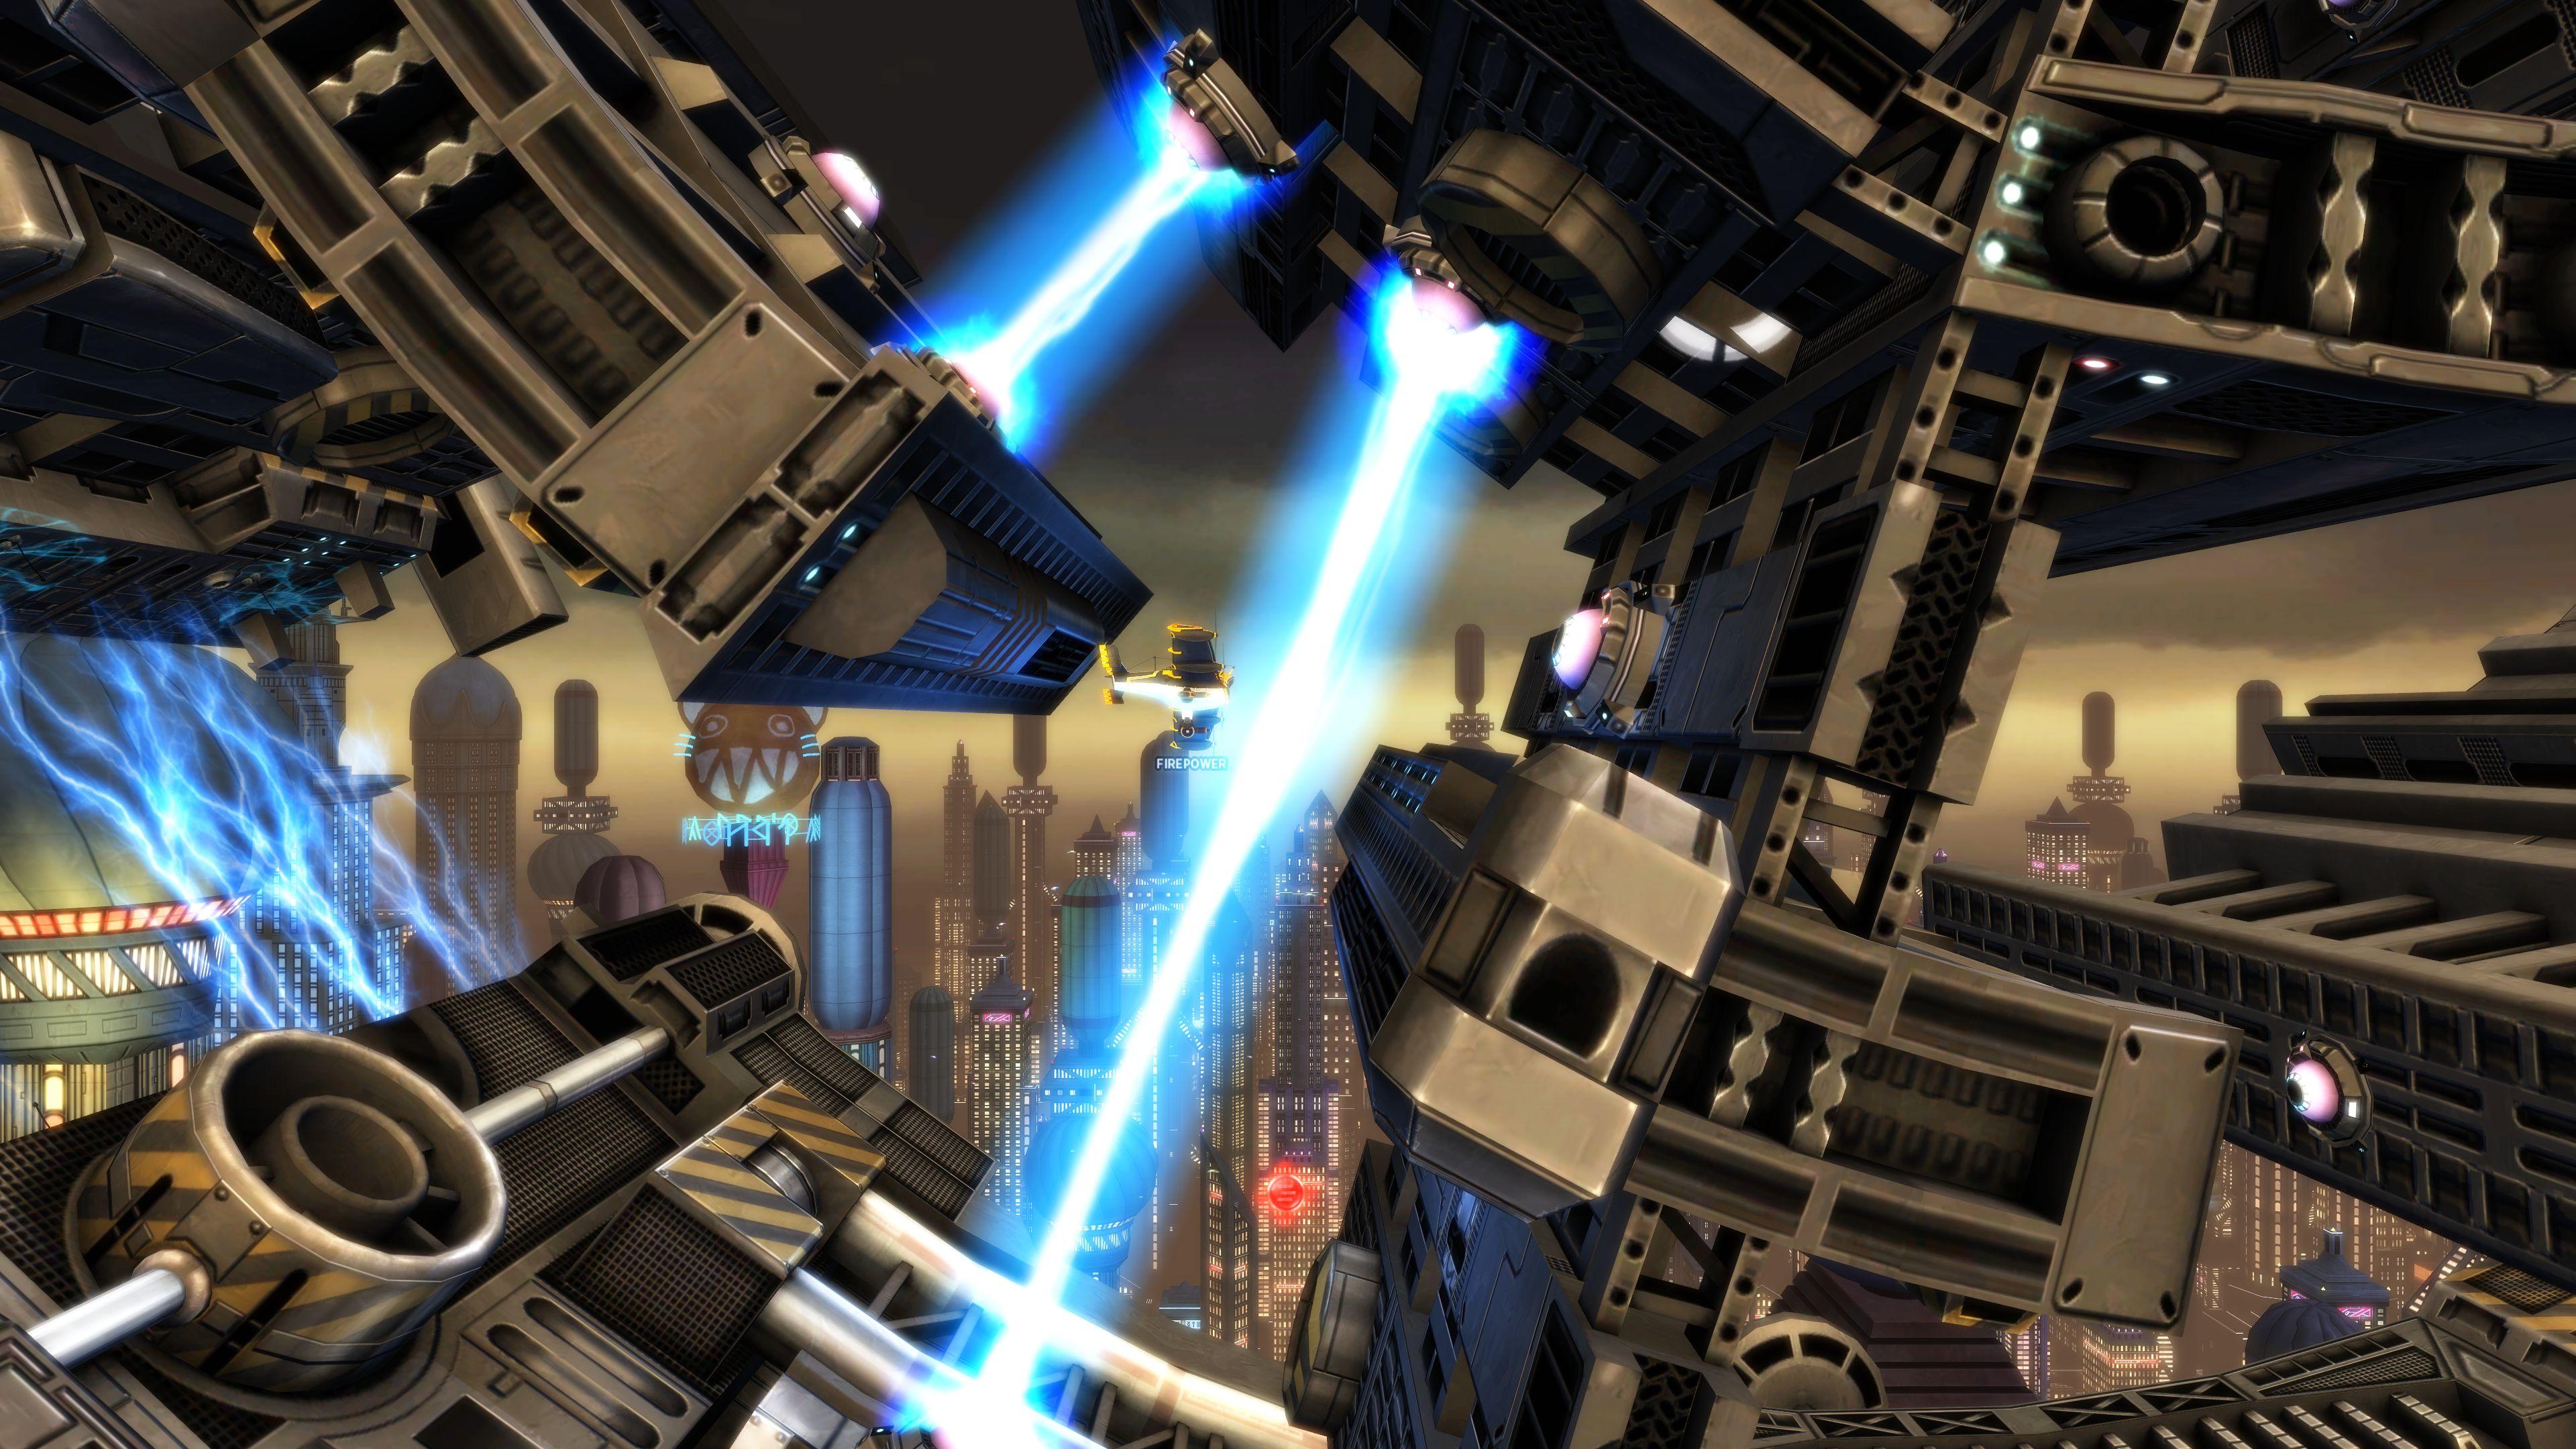 Hry pro Switch se rozrostou o Battle Chasers: Nightwar a Sine Mora EX 142177